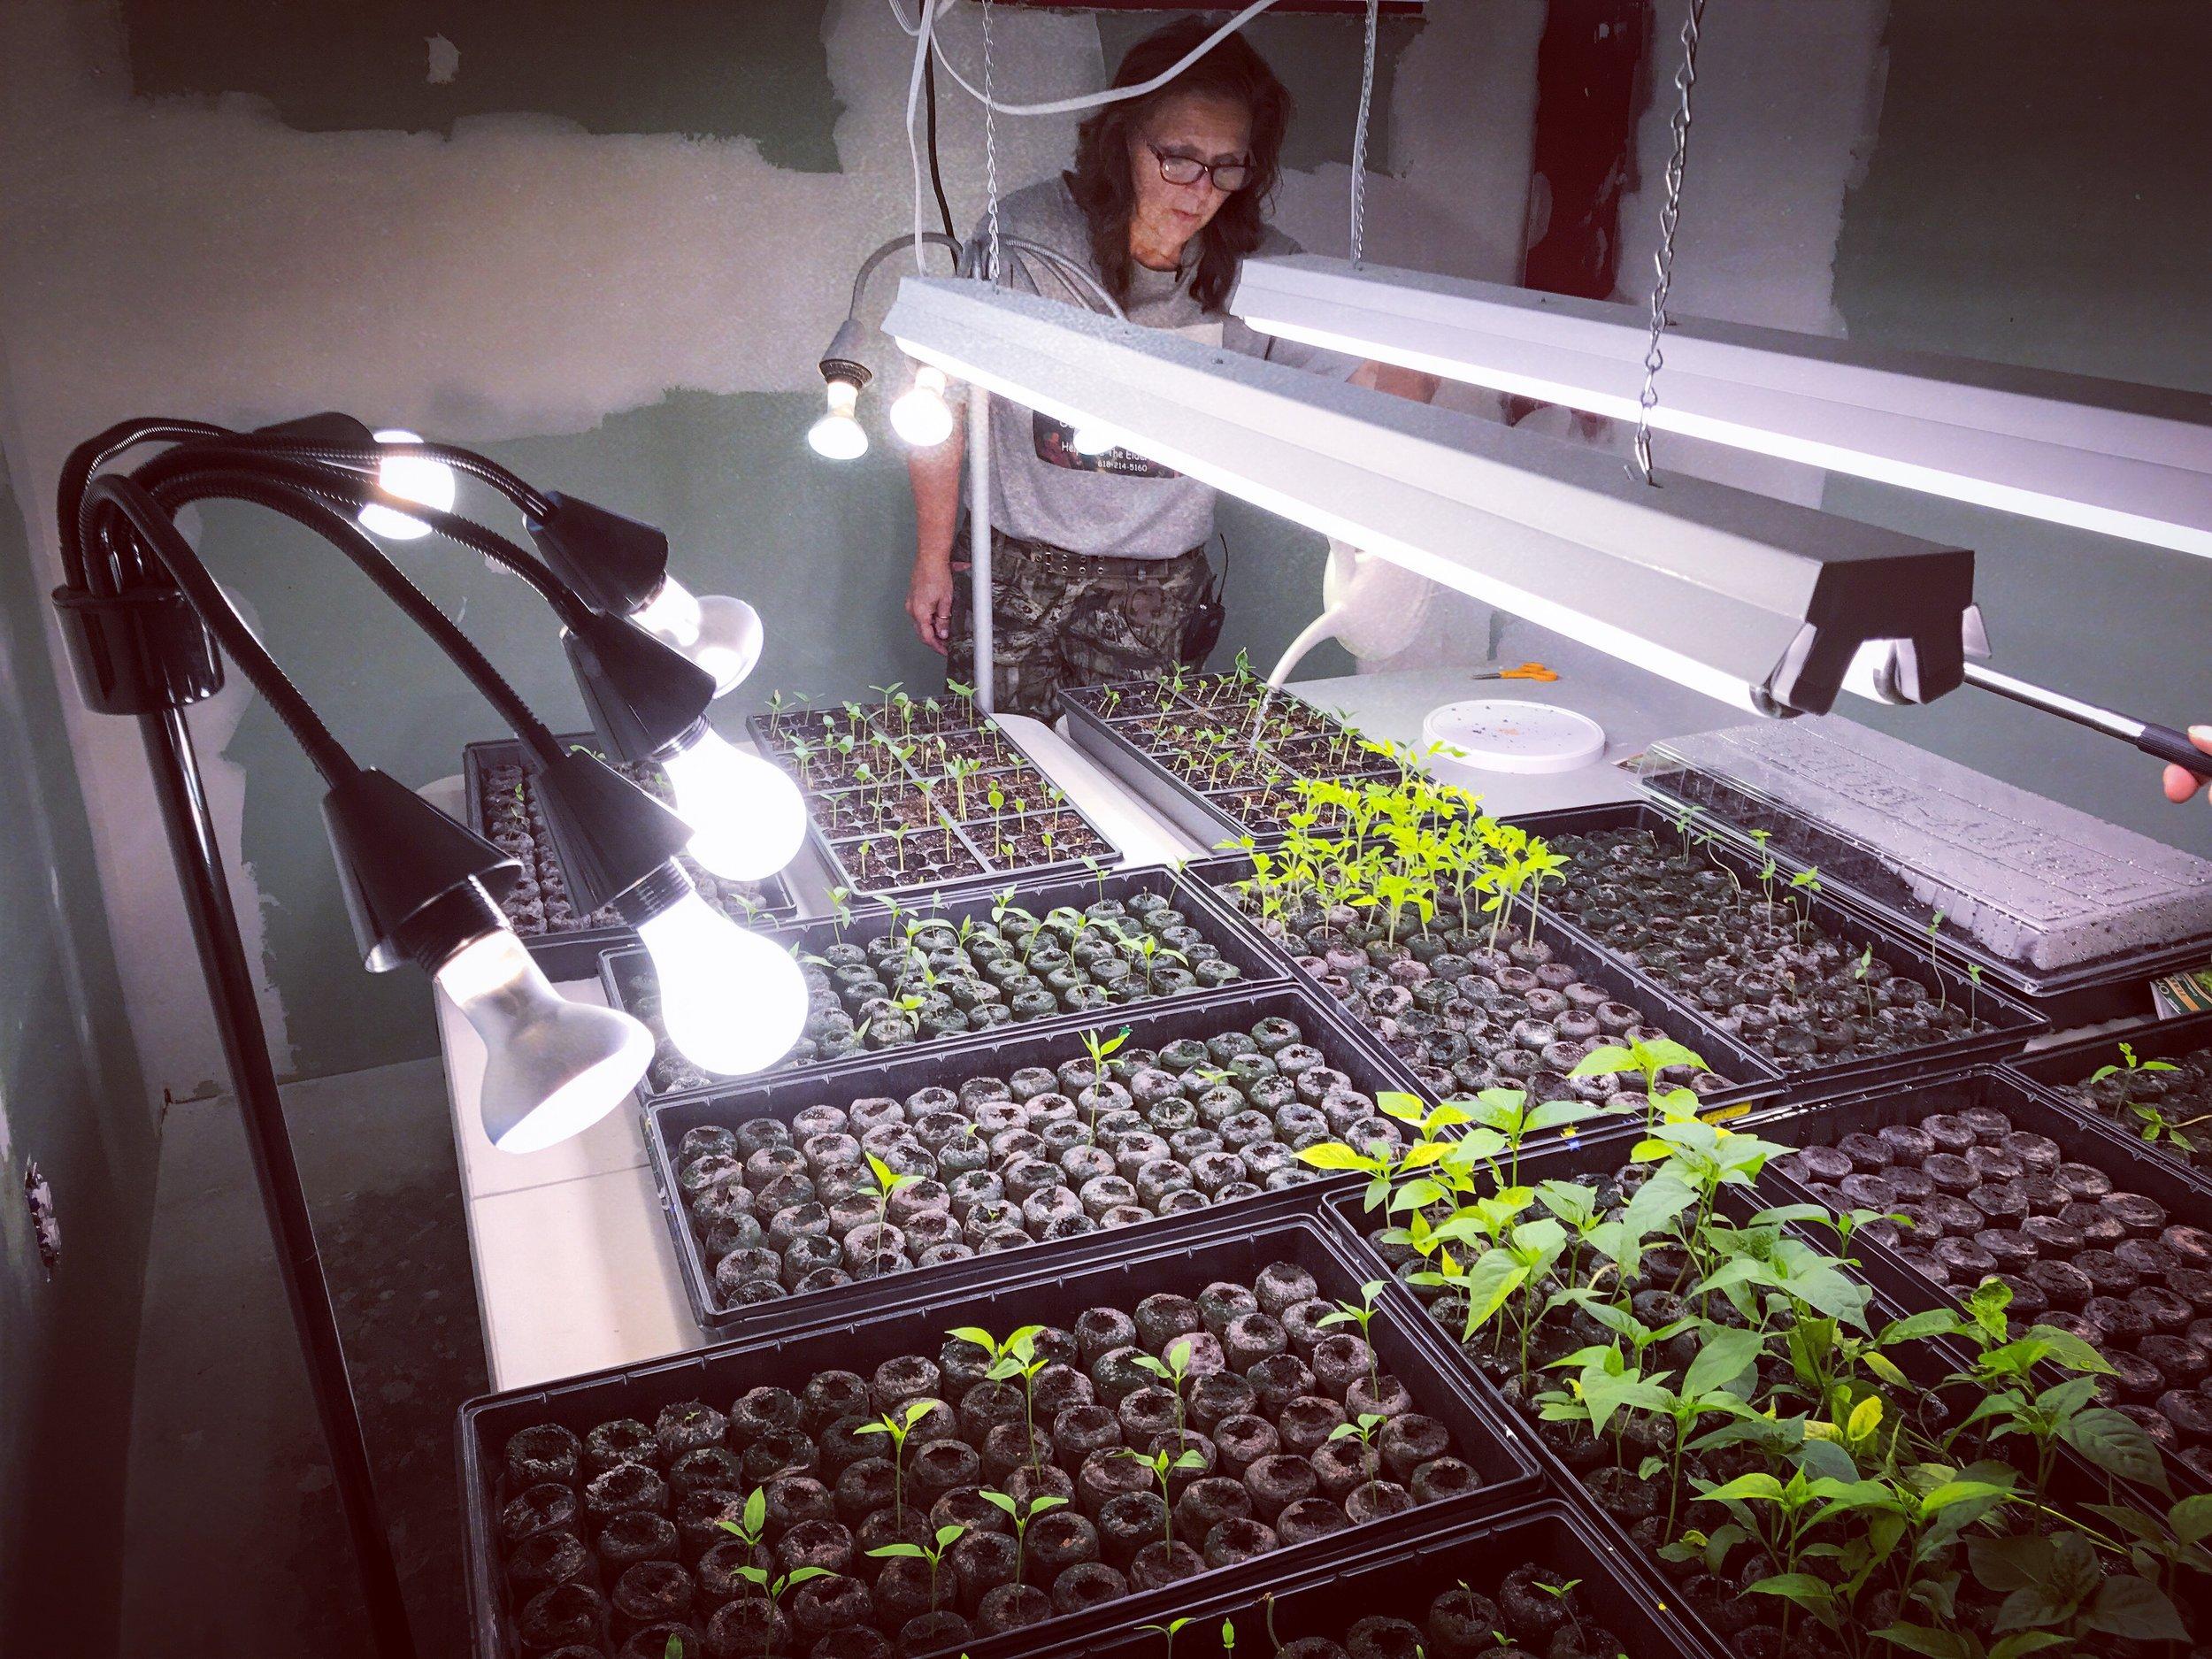 Debbra Arndt tends to her plants, O'Fallon, Missouri, April 11, 2107.